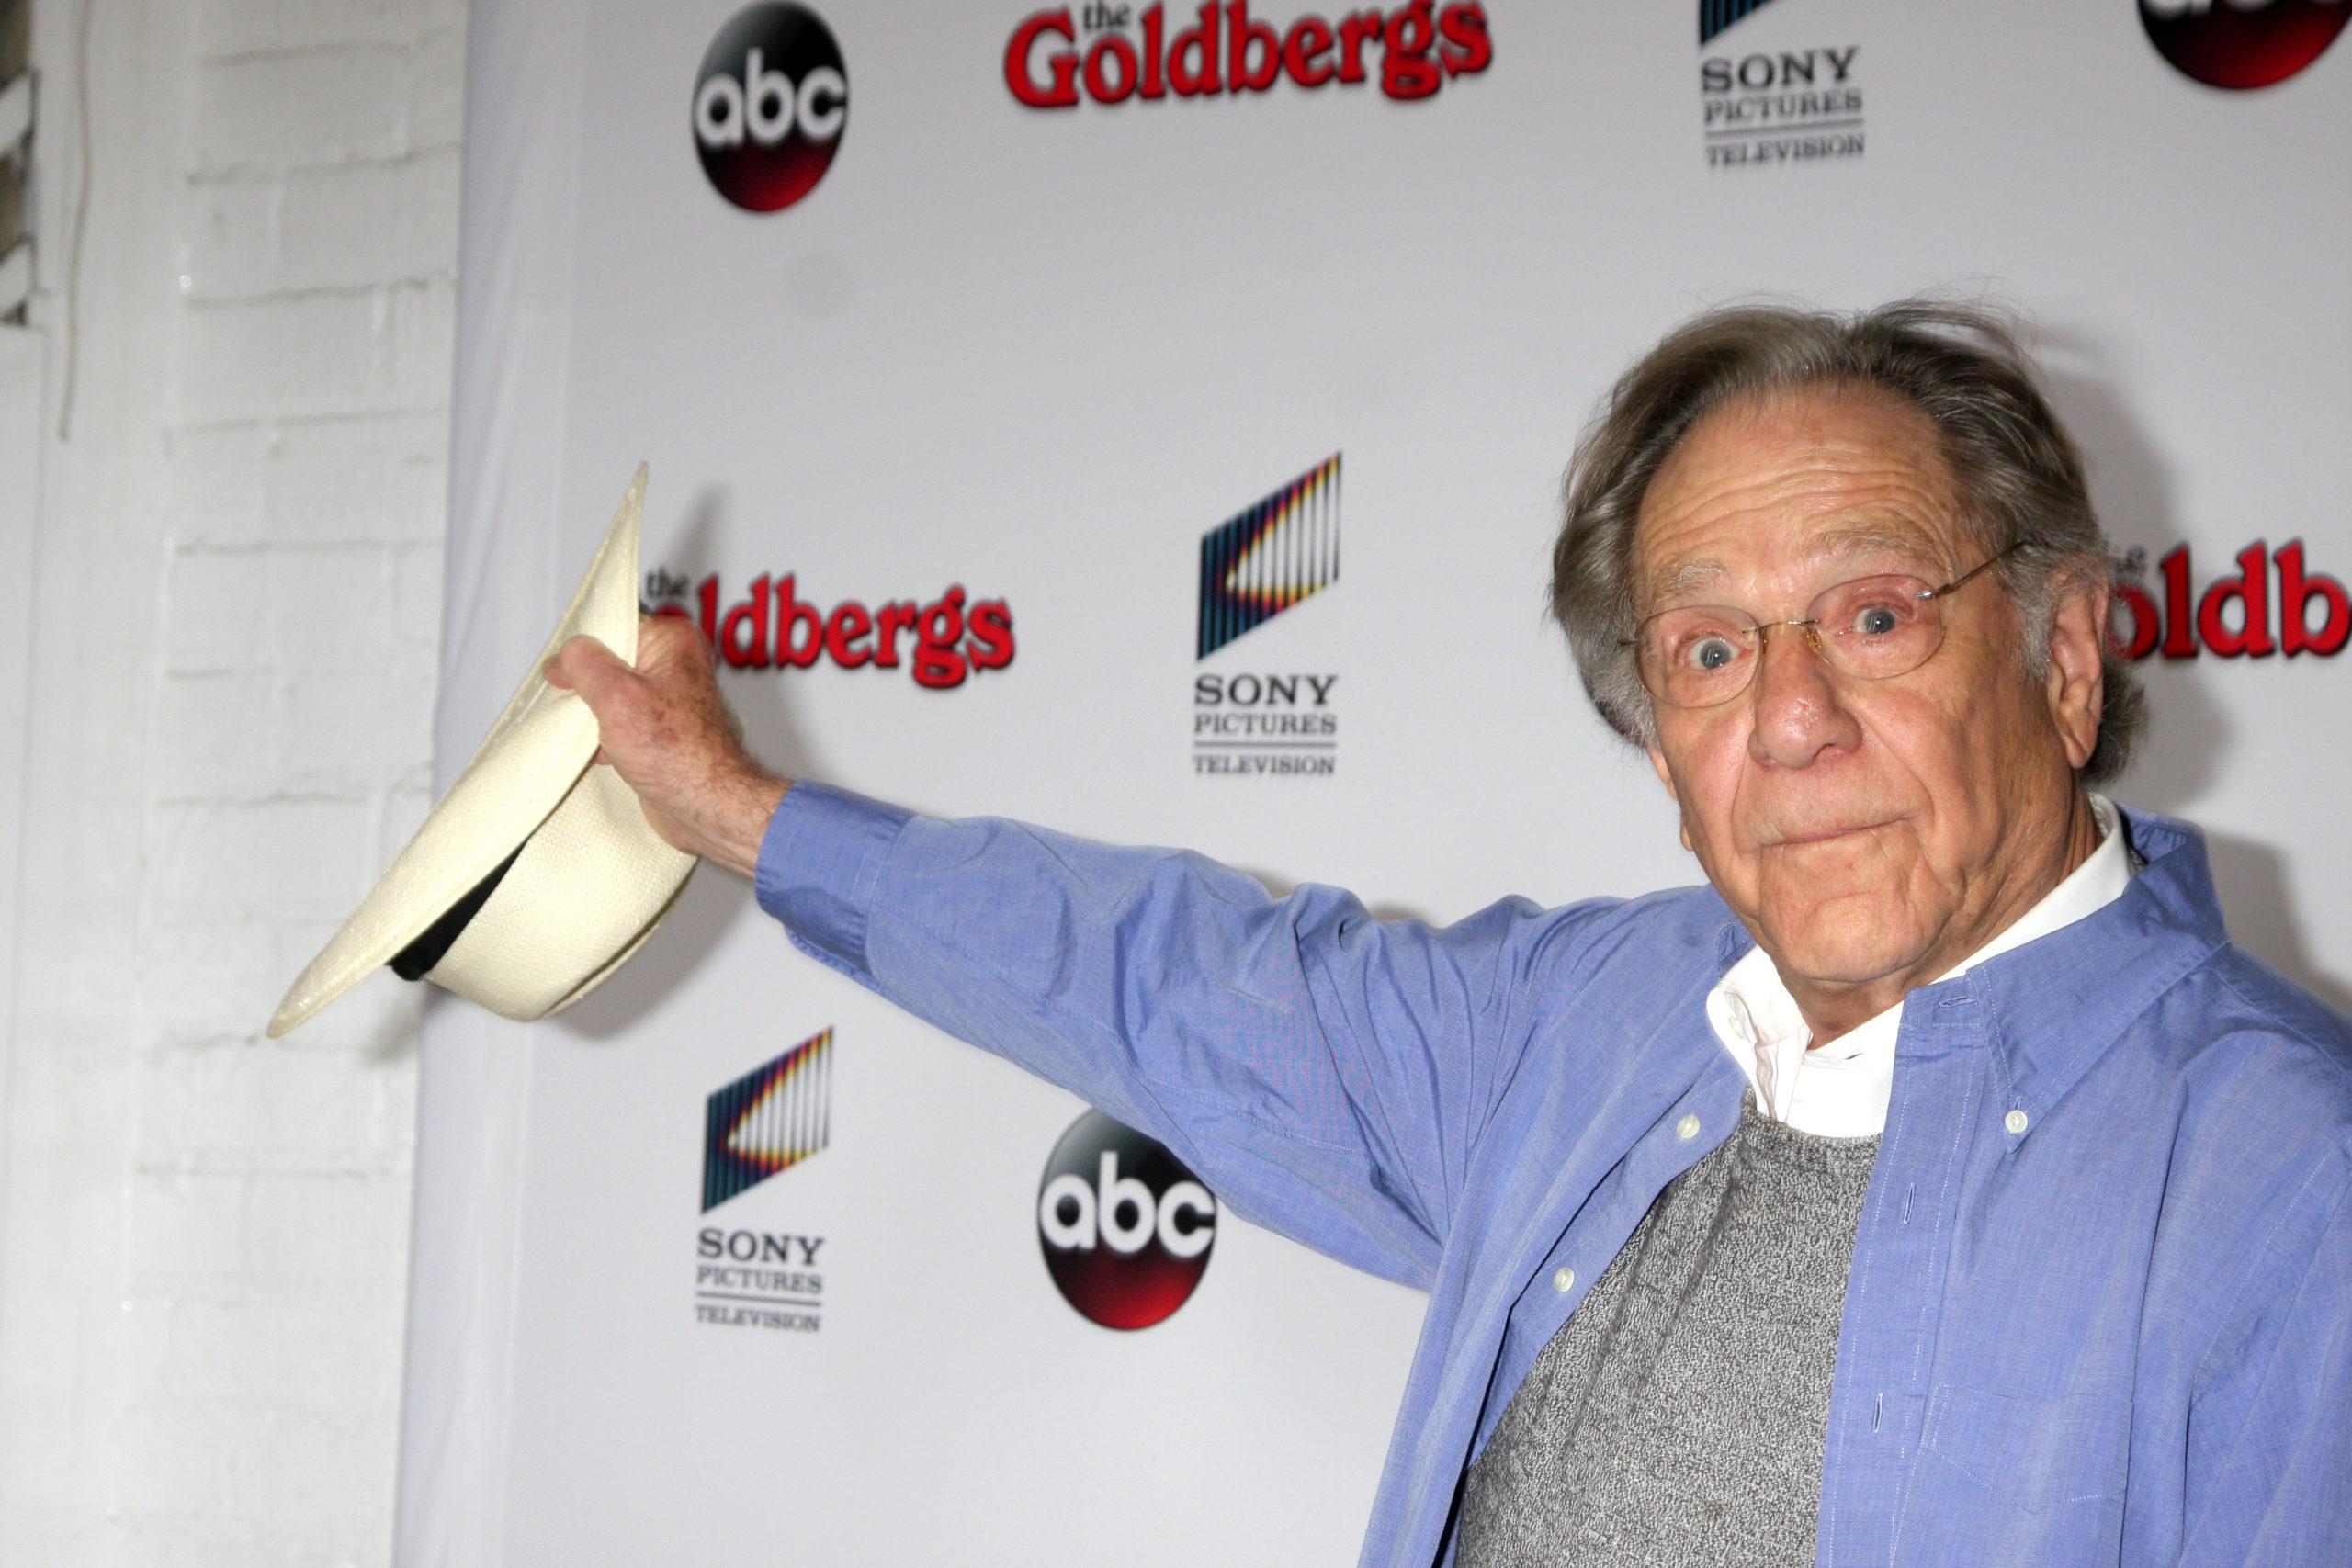 George Segal Cause of Death: How Died 'The Goldbergs' Actor Die?